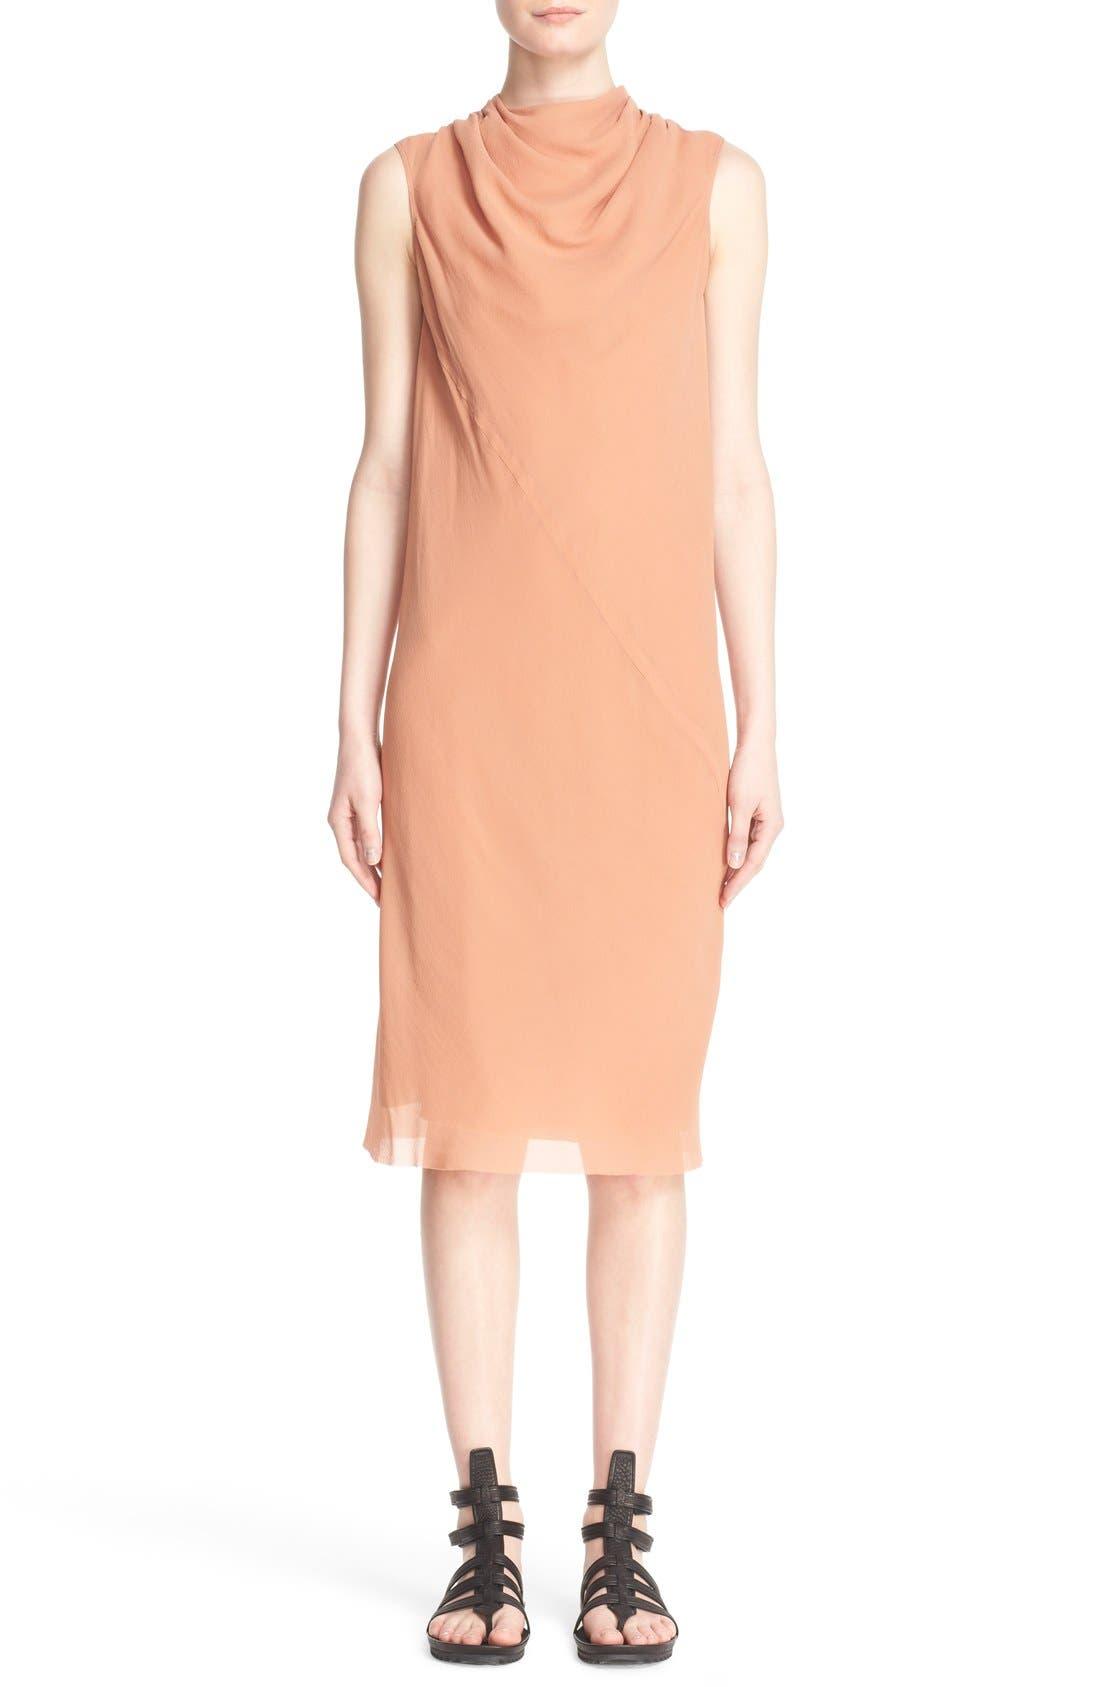 Alternate Image 1 Selected - Rick Owens 'Bonnie' Sleeveless Silk Georgette Sheath Dress